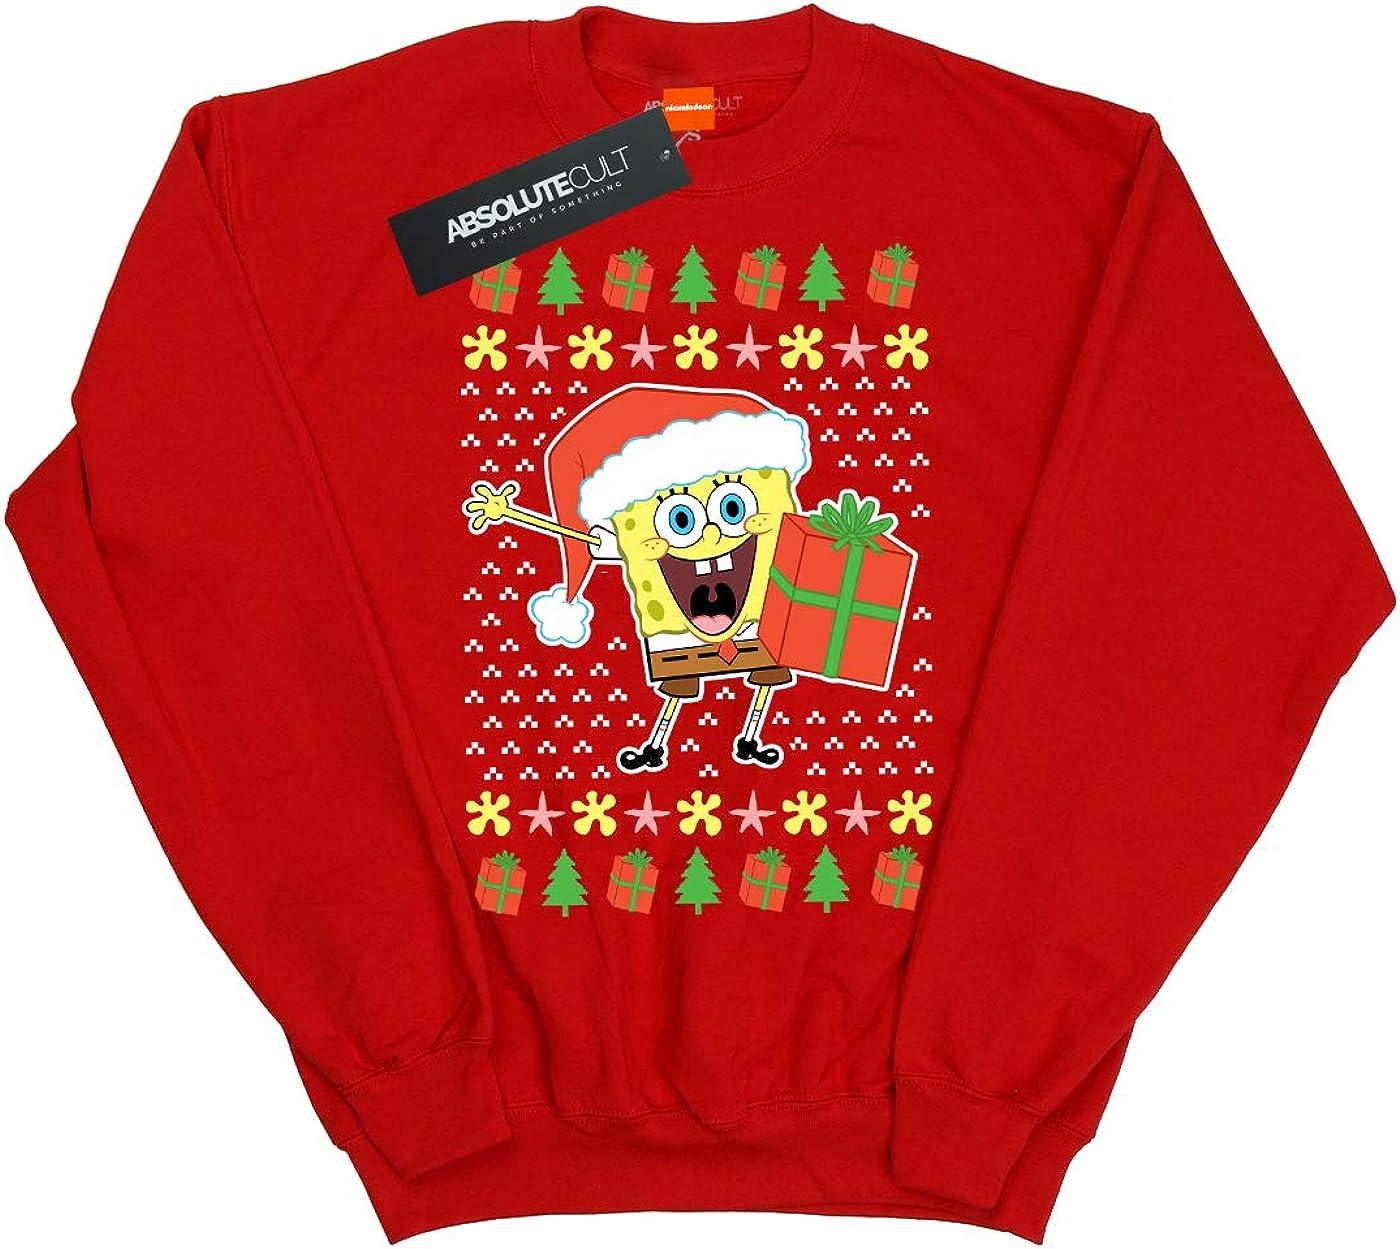 Absolute Cult Spongebob Squarepants Girls Ugly Christmas Sweatshirt